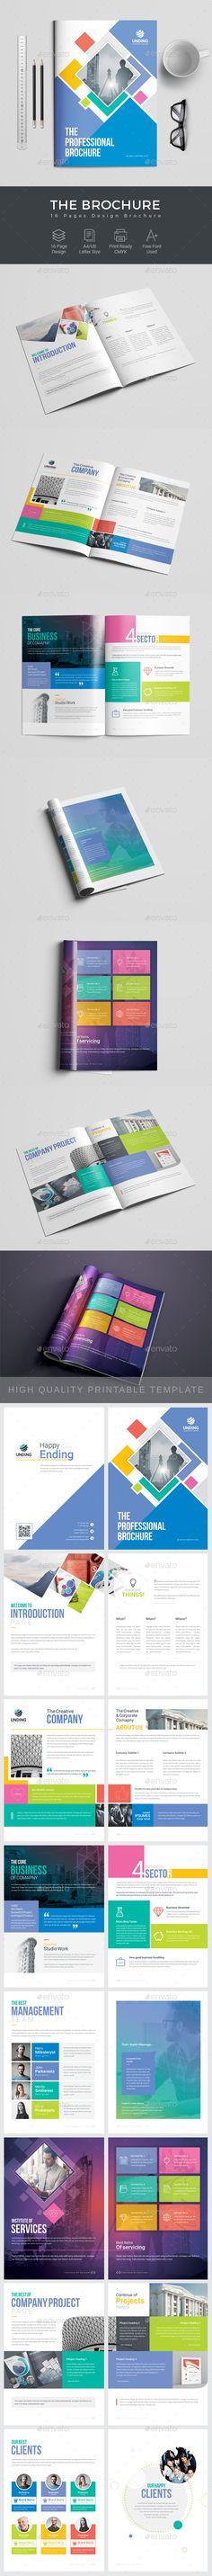 employee handbook manual design template indesign indd download